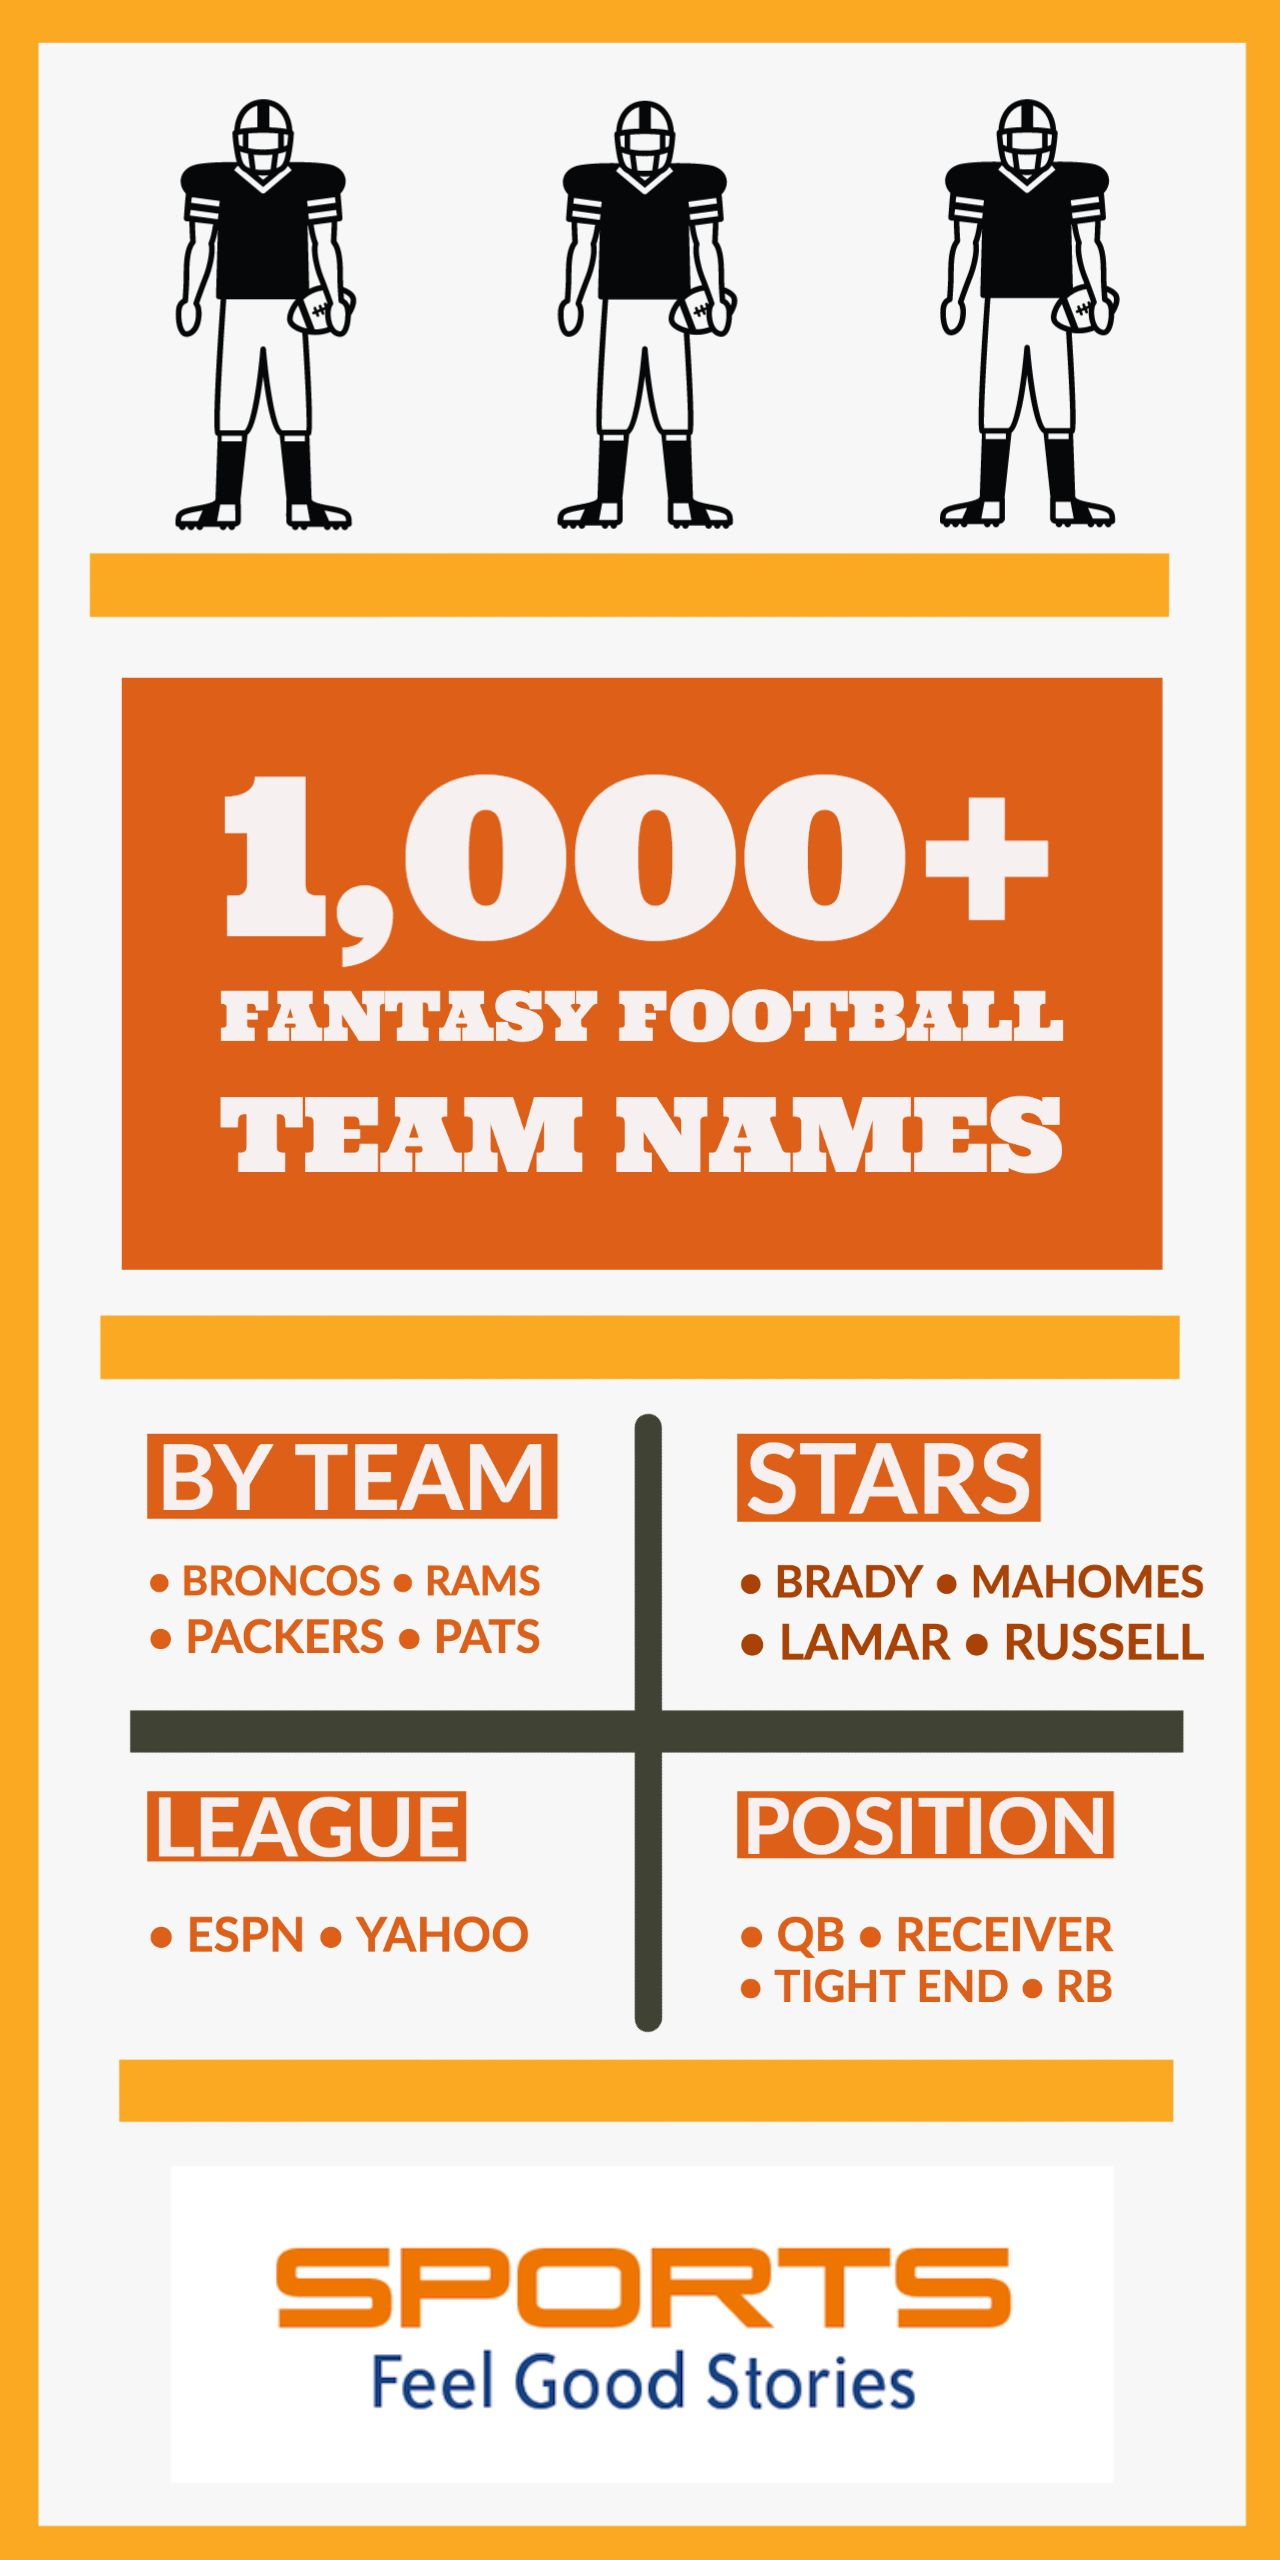 Nfl Fantasy Football Headquarters Team Names Articles Resources In 2020 Football Team Names Fantasy Football Team Names